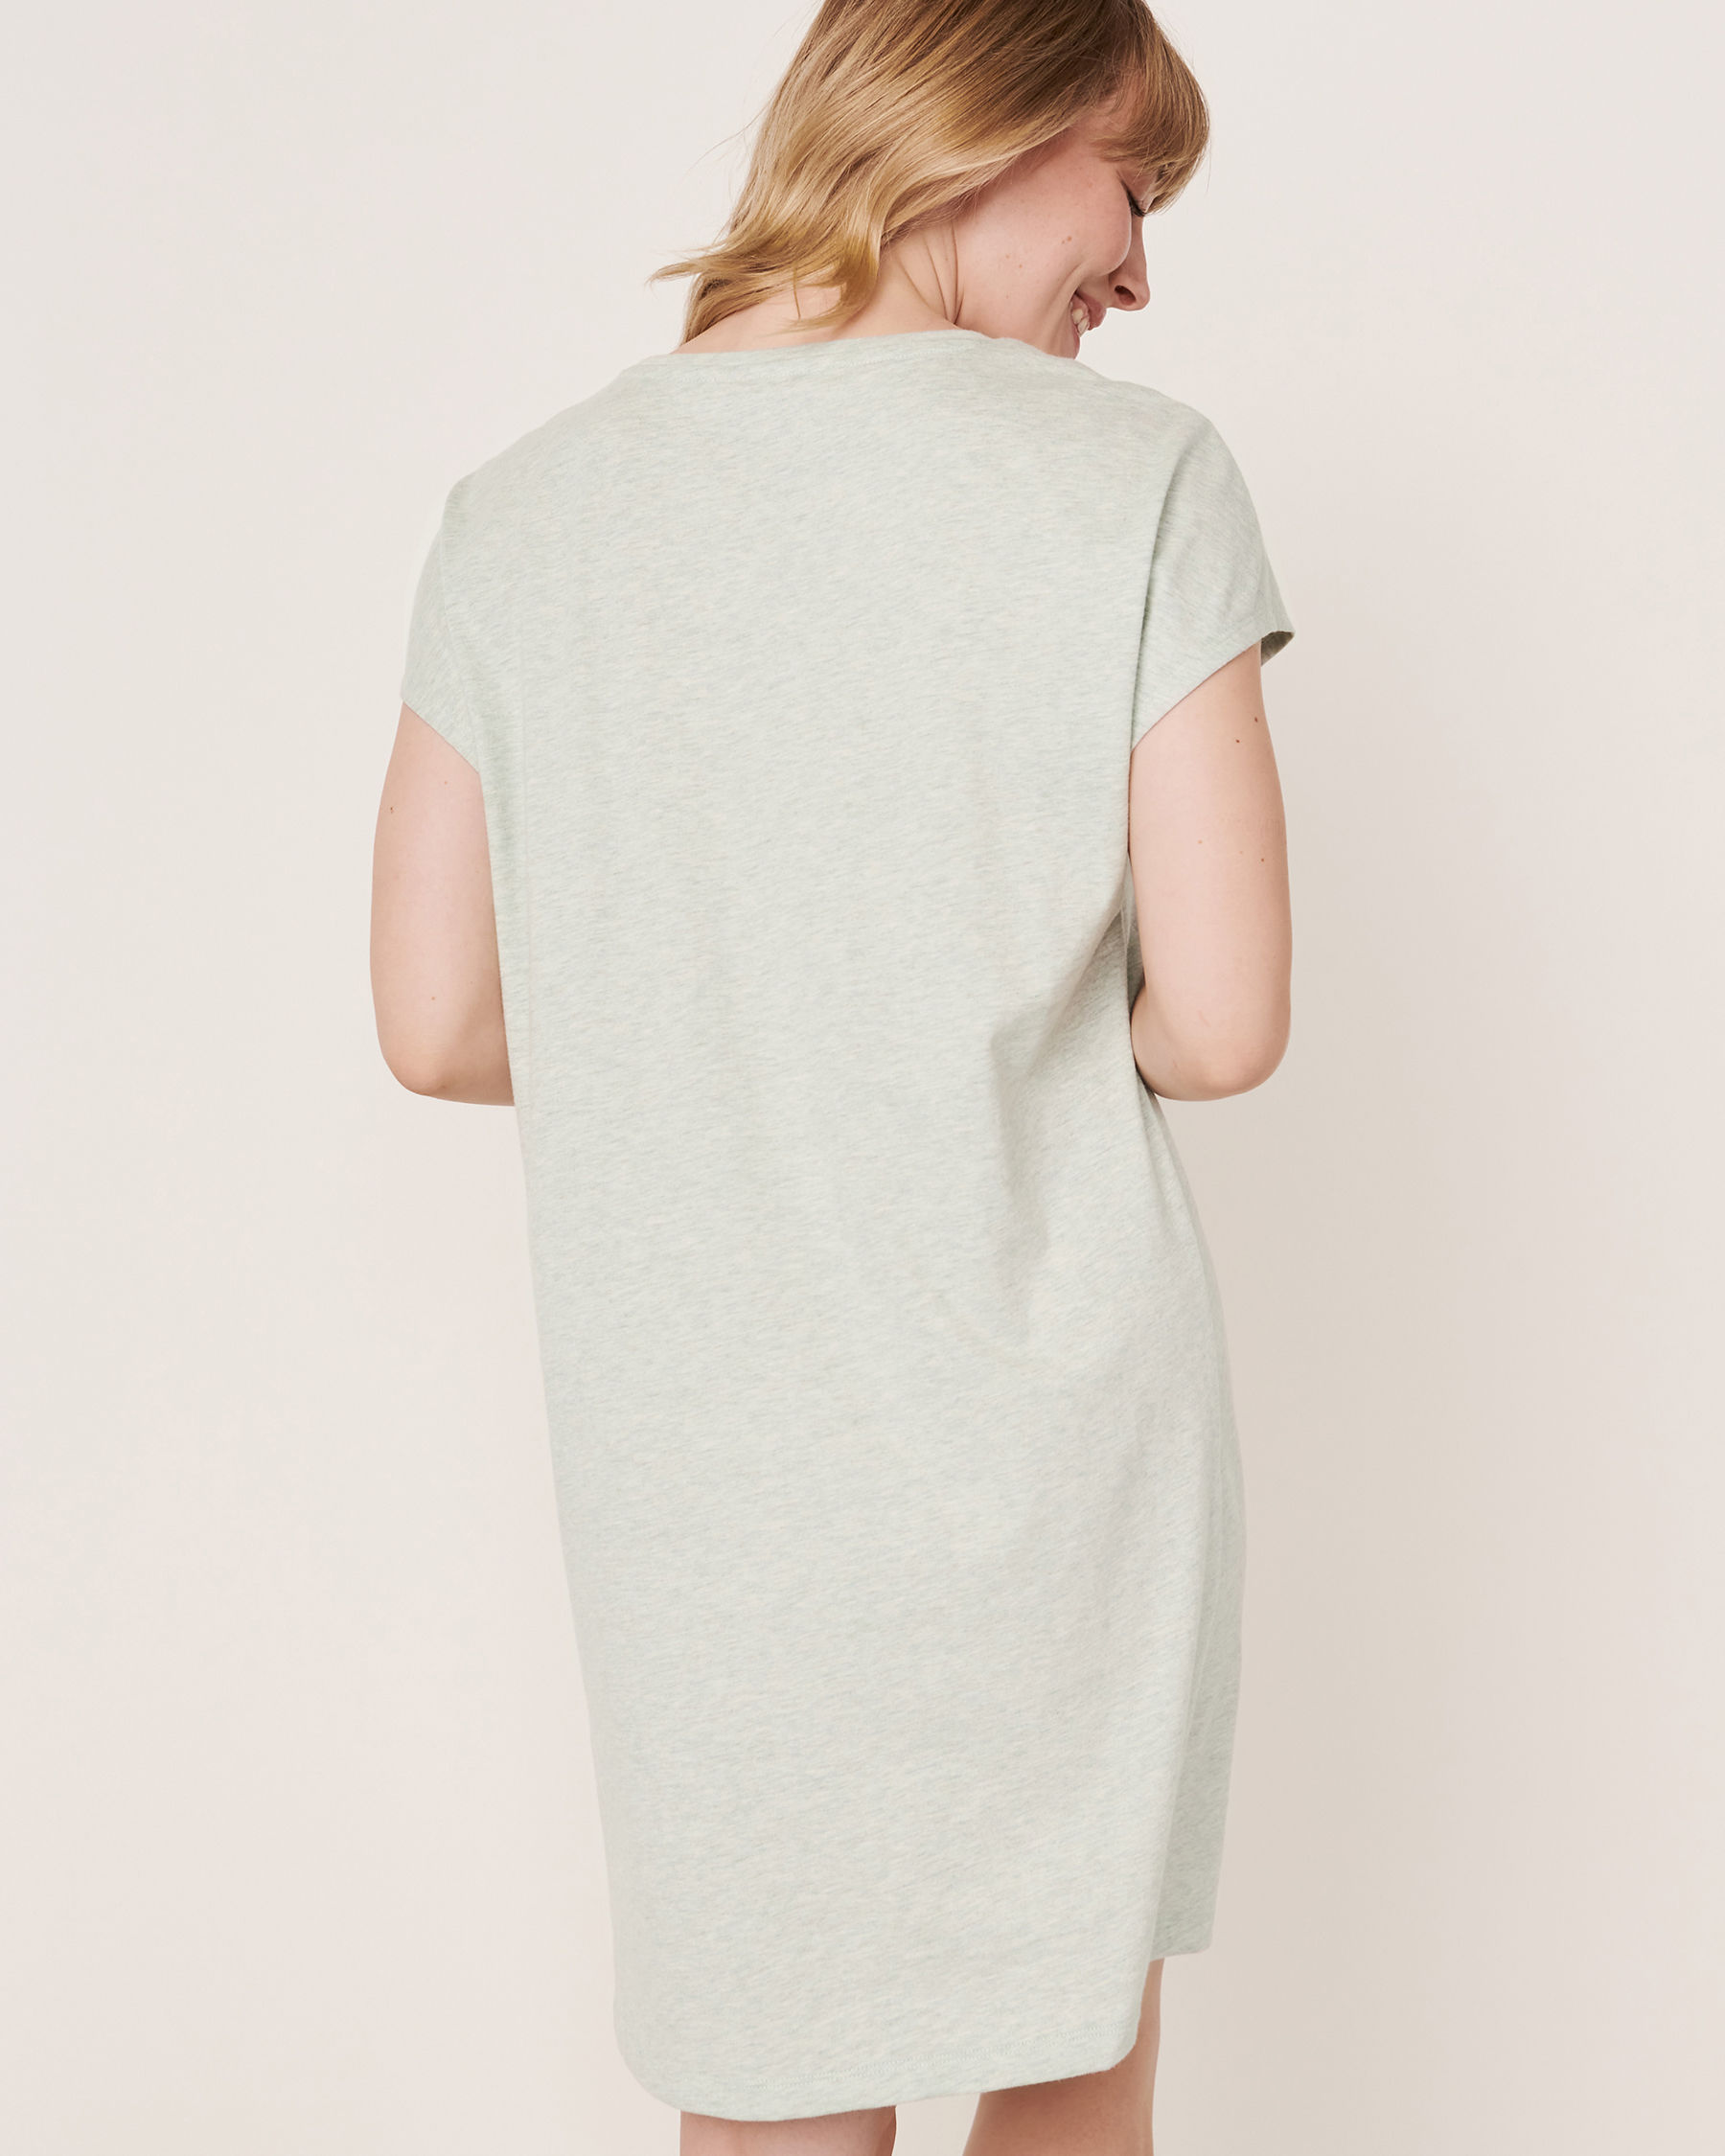 LA VIE EN ROSE Embroidered Detail  Scoop Neck Short Sleeve Sleepshirt Grey-blue 40500071 - View2